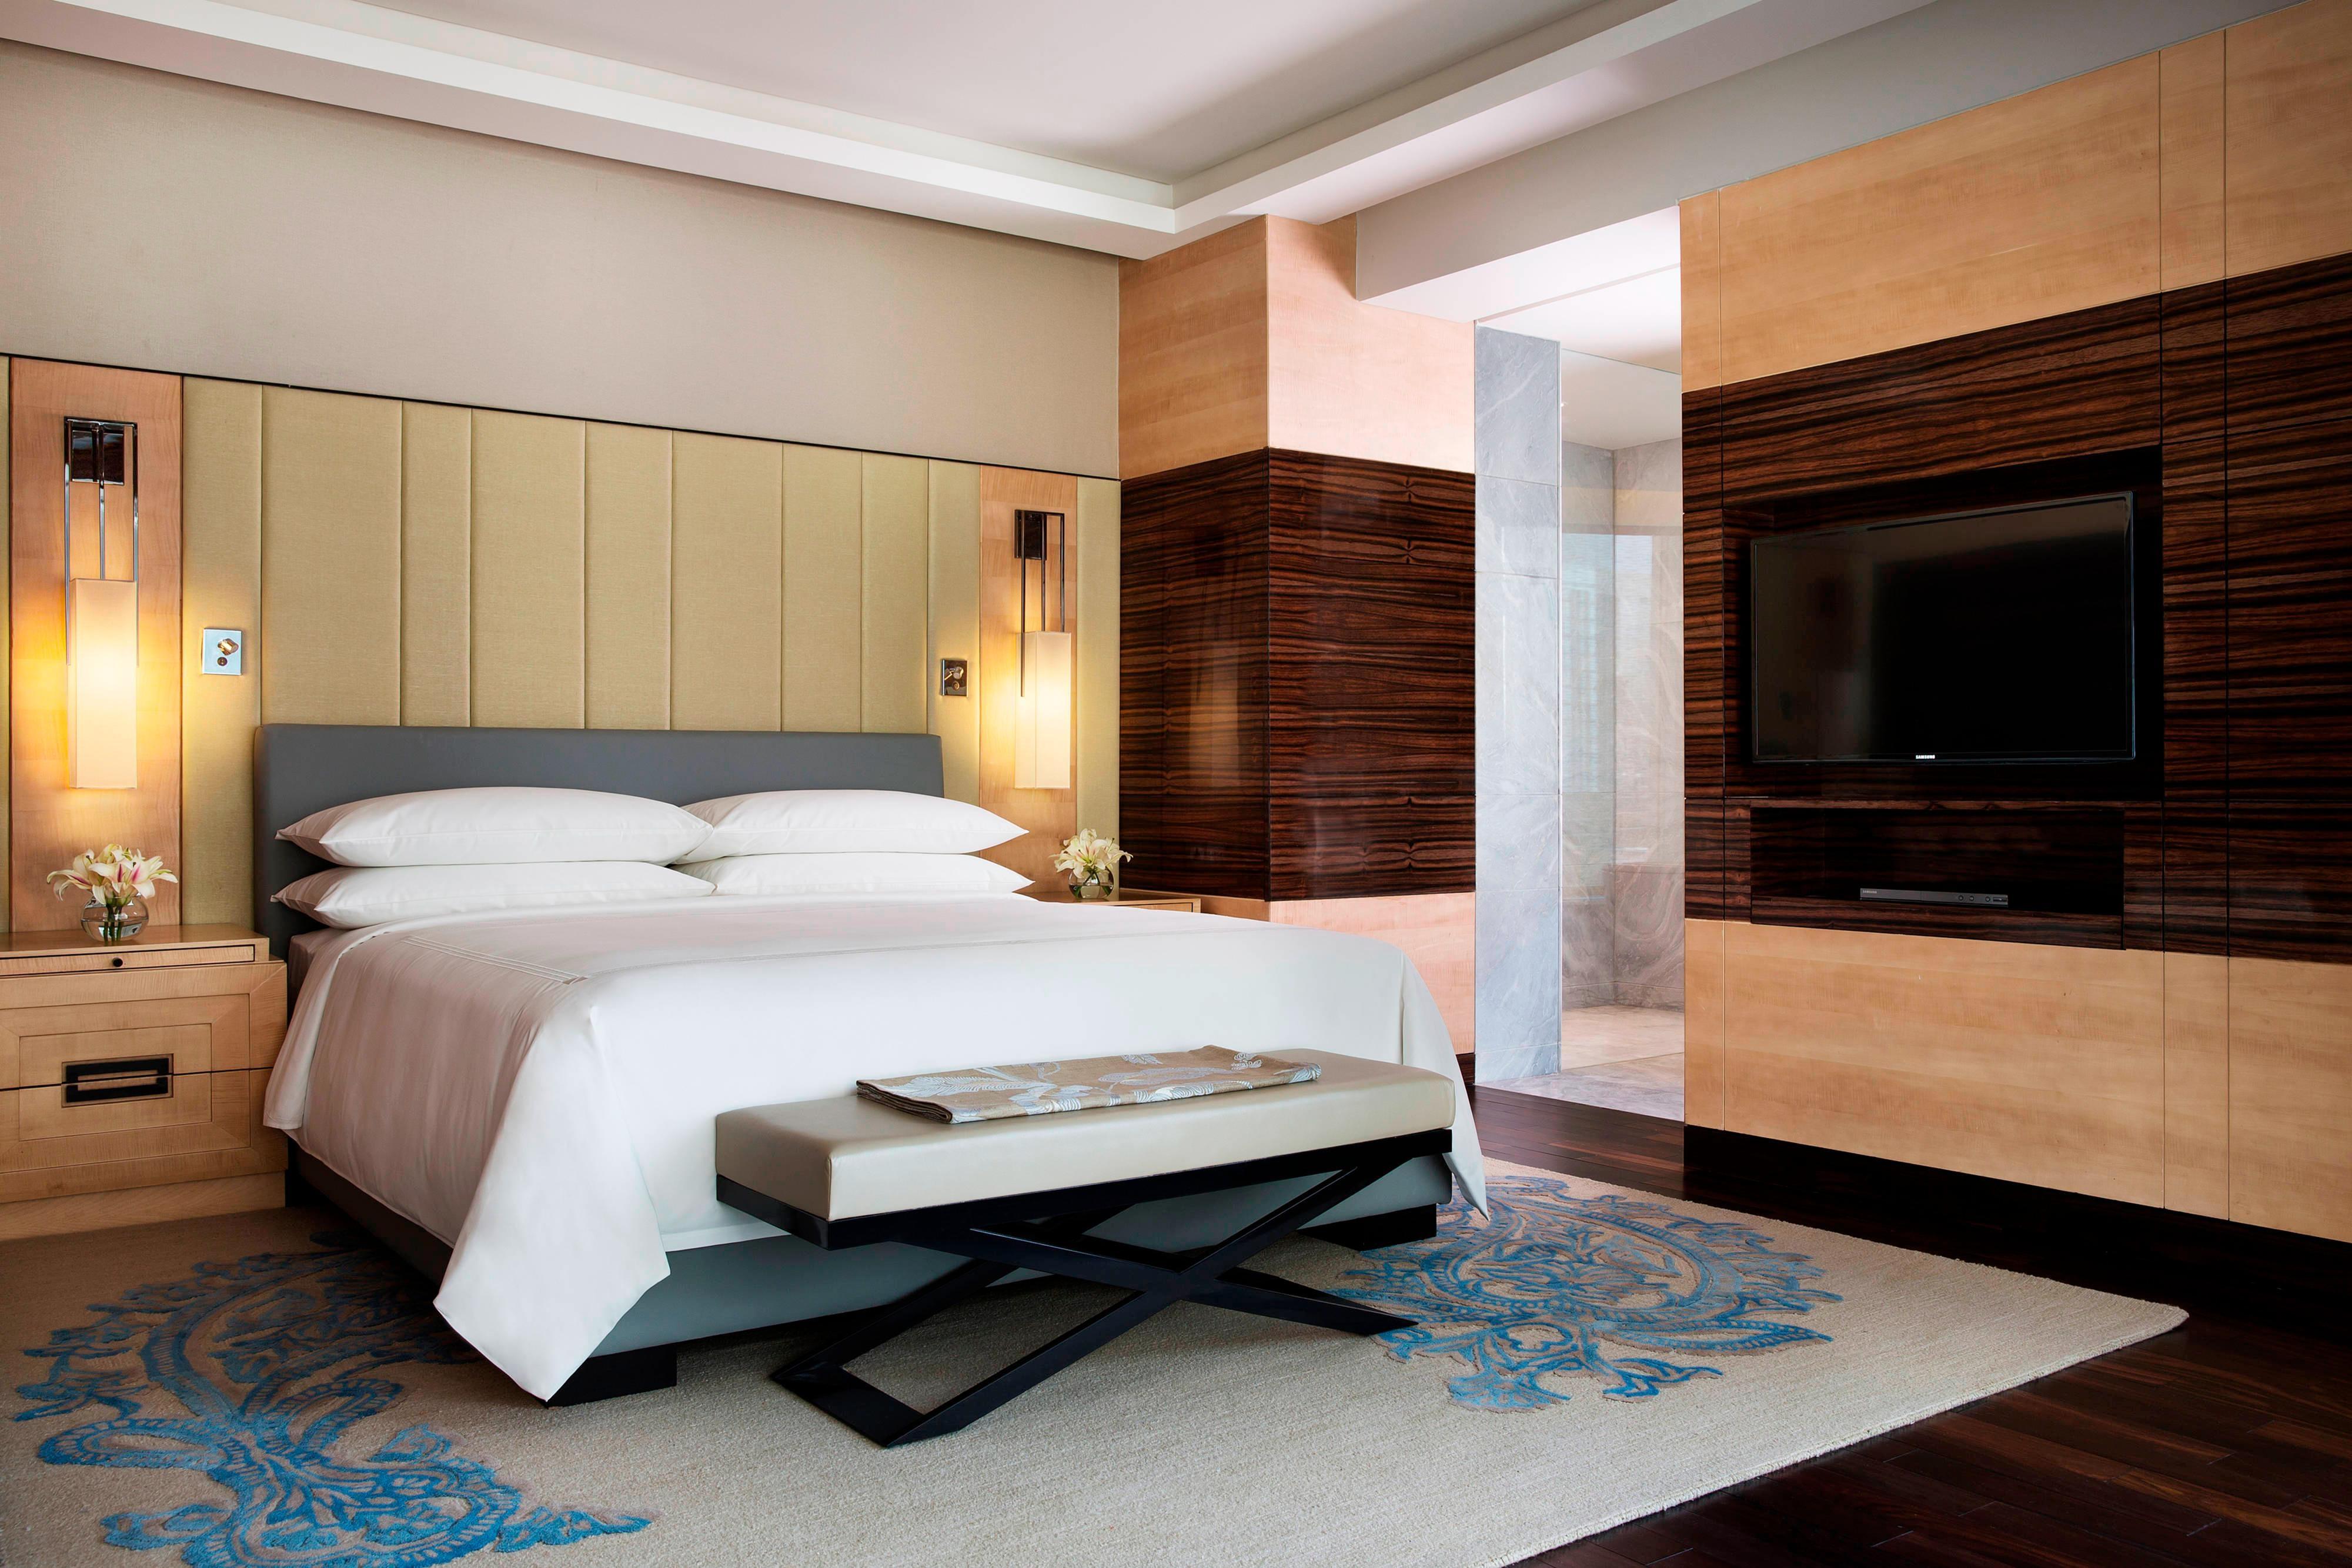 Luxury Hotel In Delhi Ncr Jw Marriott